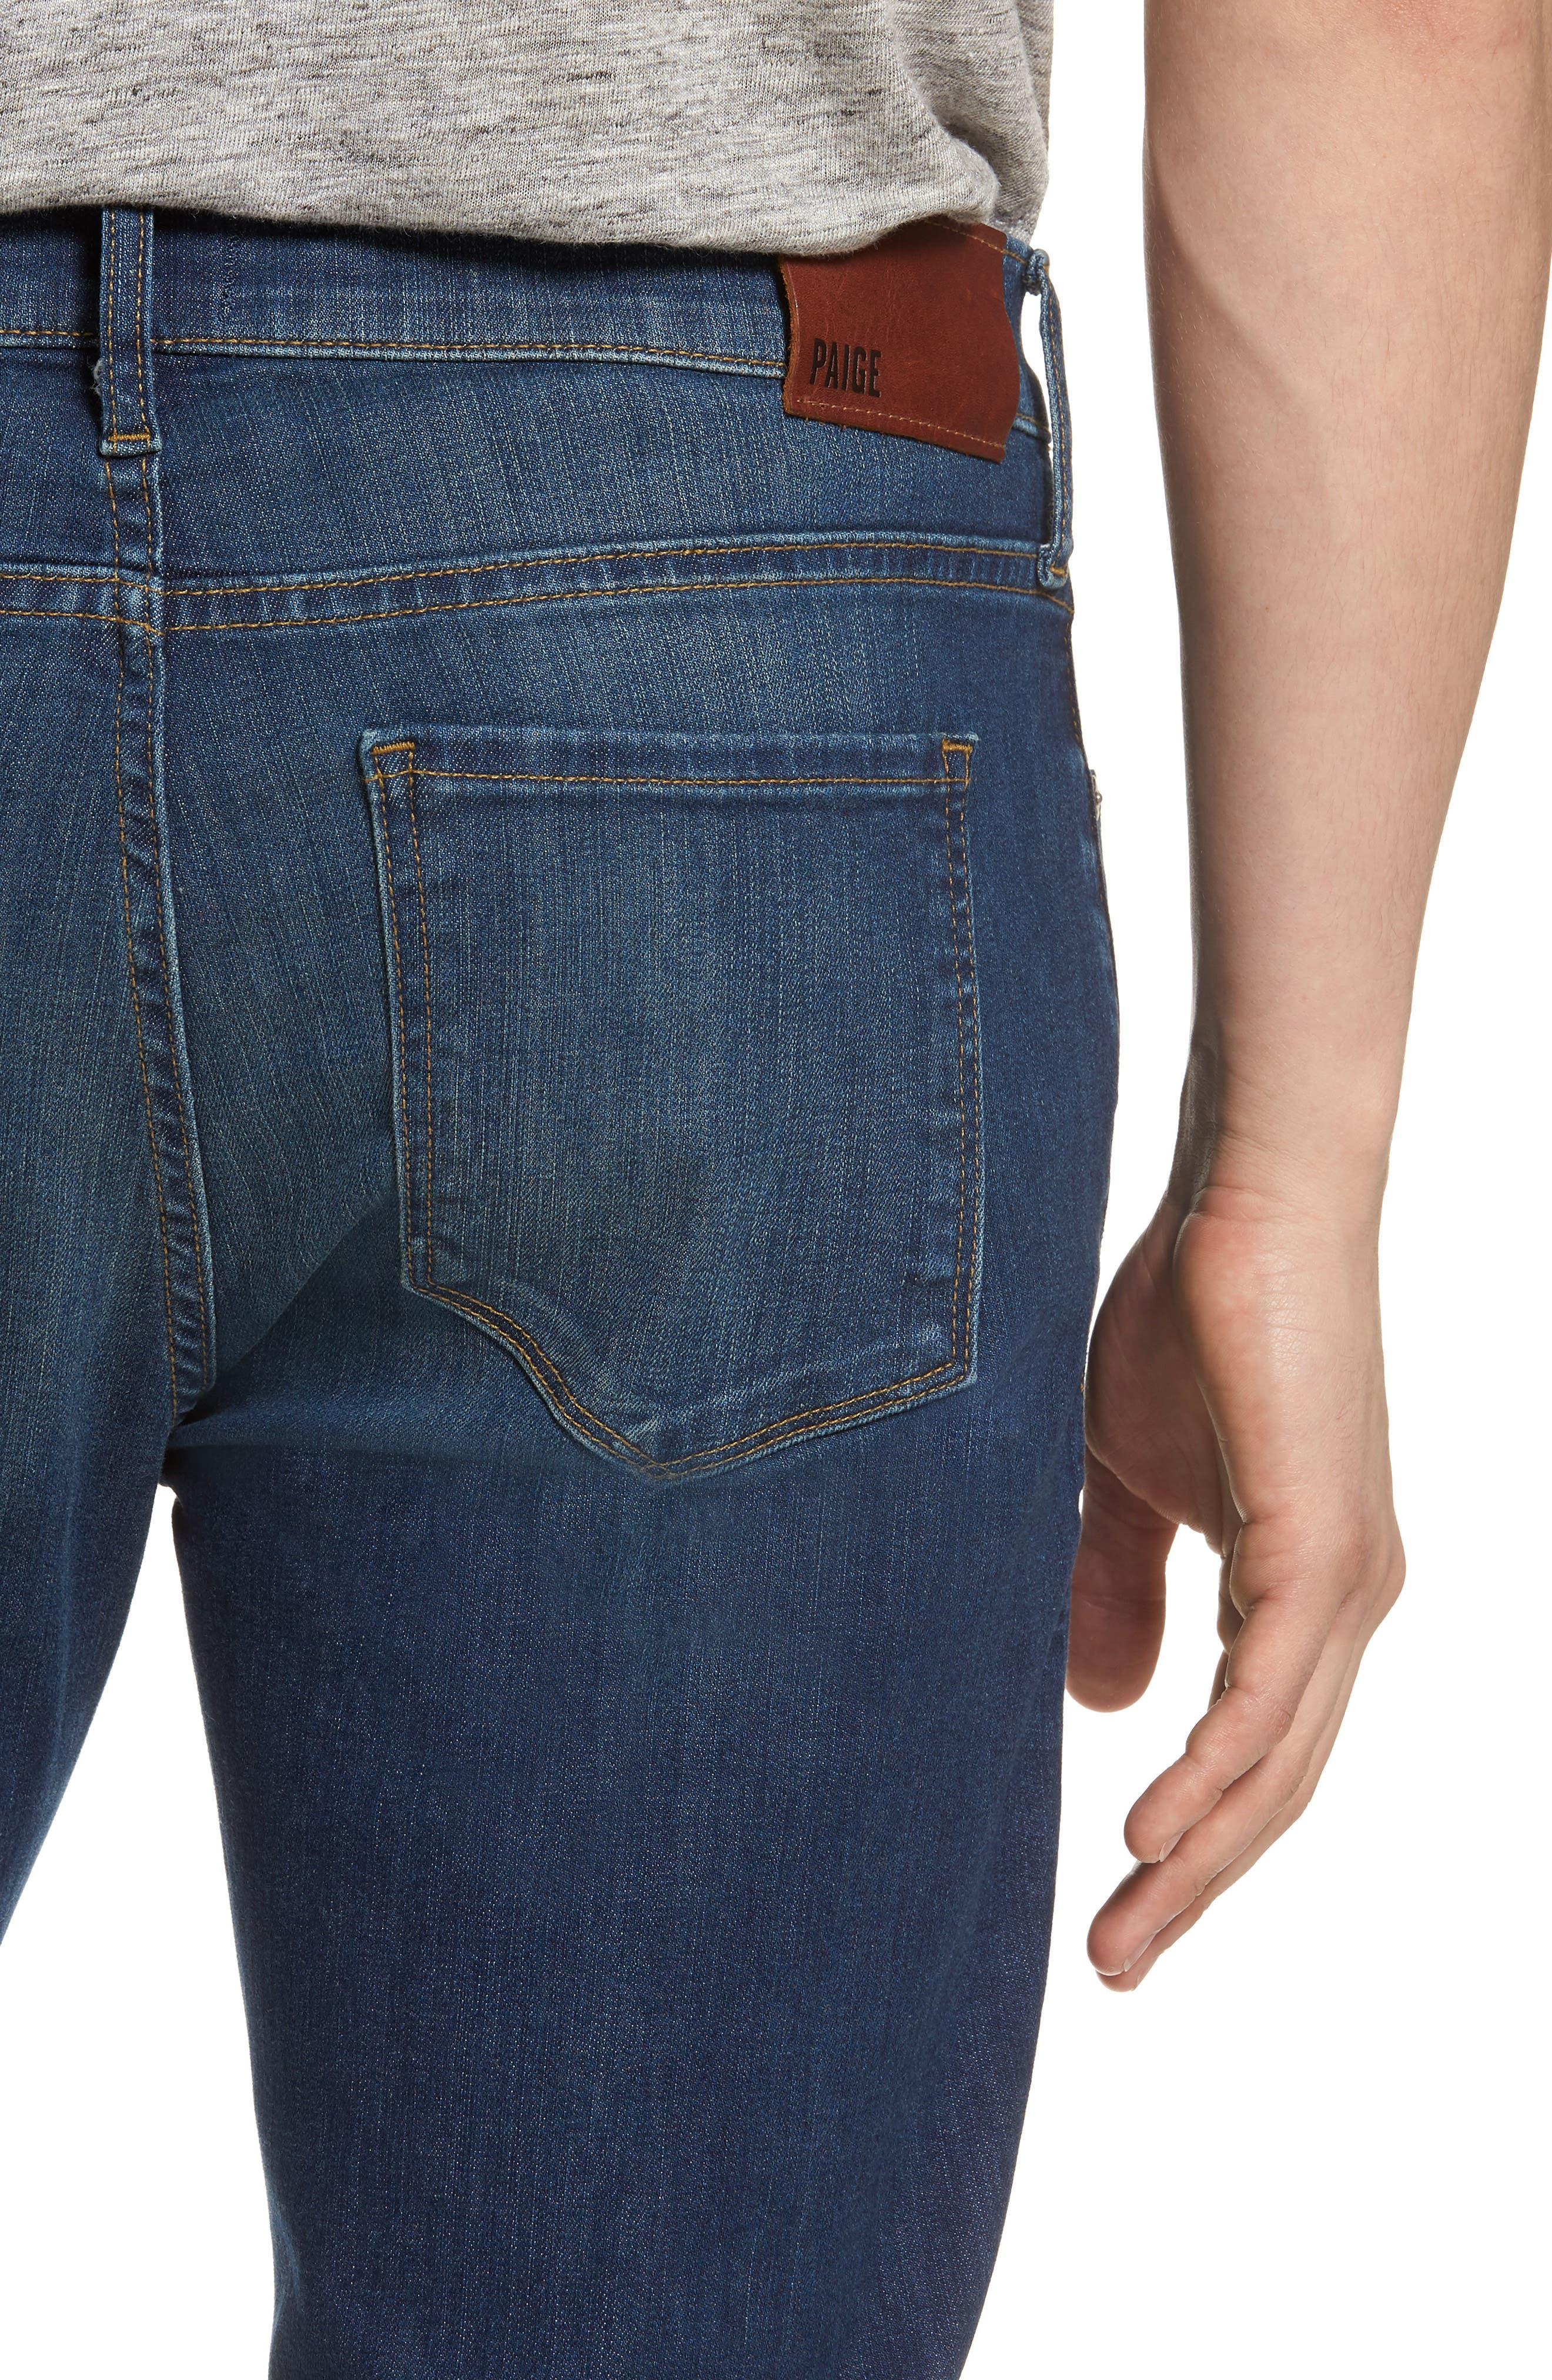 Lennox Slim Fit Jeans,                             Alternate thumbnail 4, color,                             Harlan Destructed